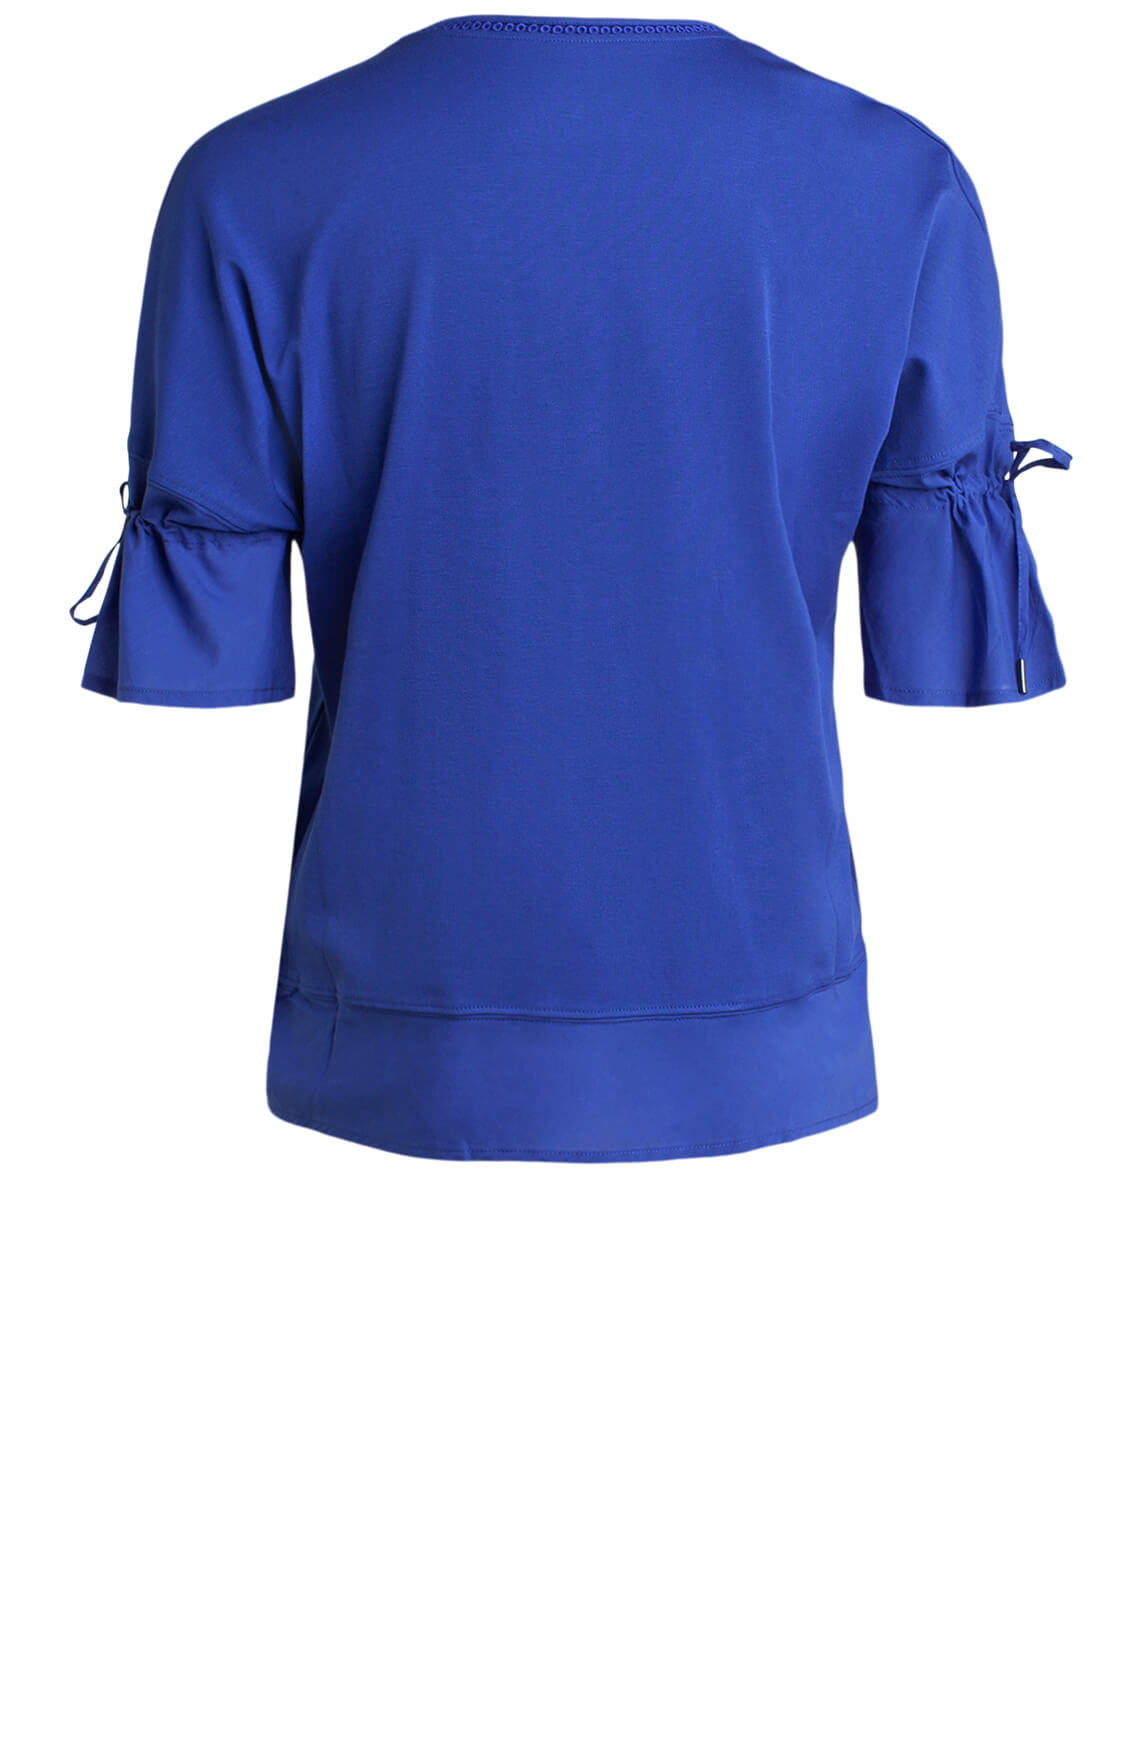 Marccain Dames Shirt met borduursel Blauw